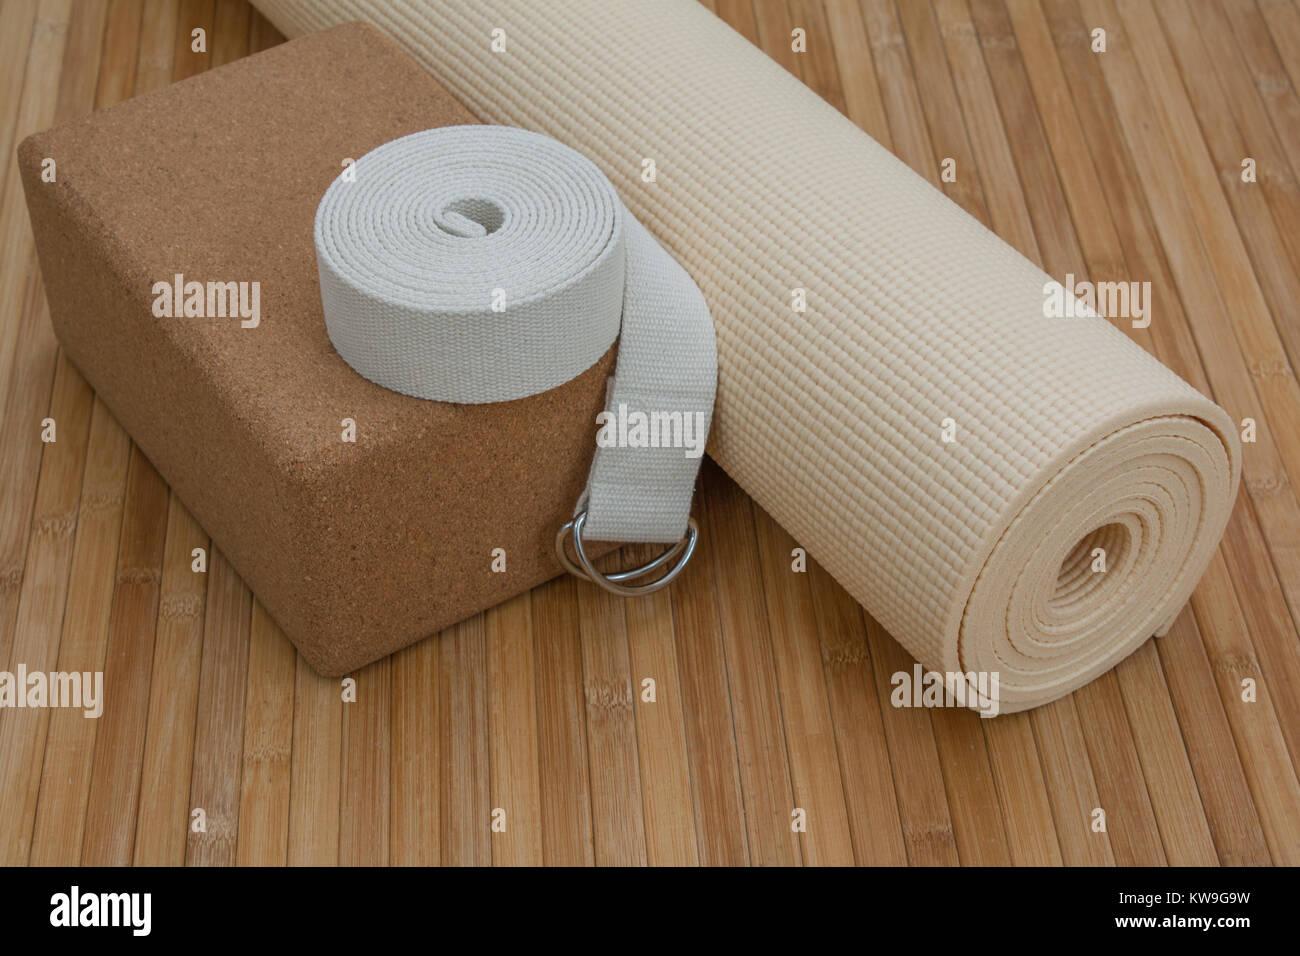 Yoga Zubehor Auf Bambus Matte Boden Bereit Fur Yoga Retreat